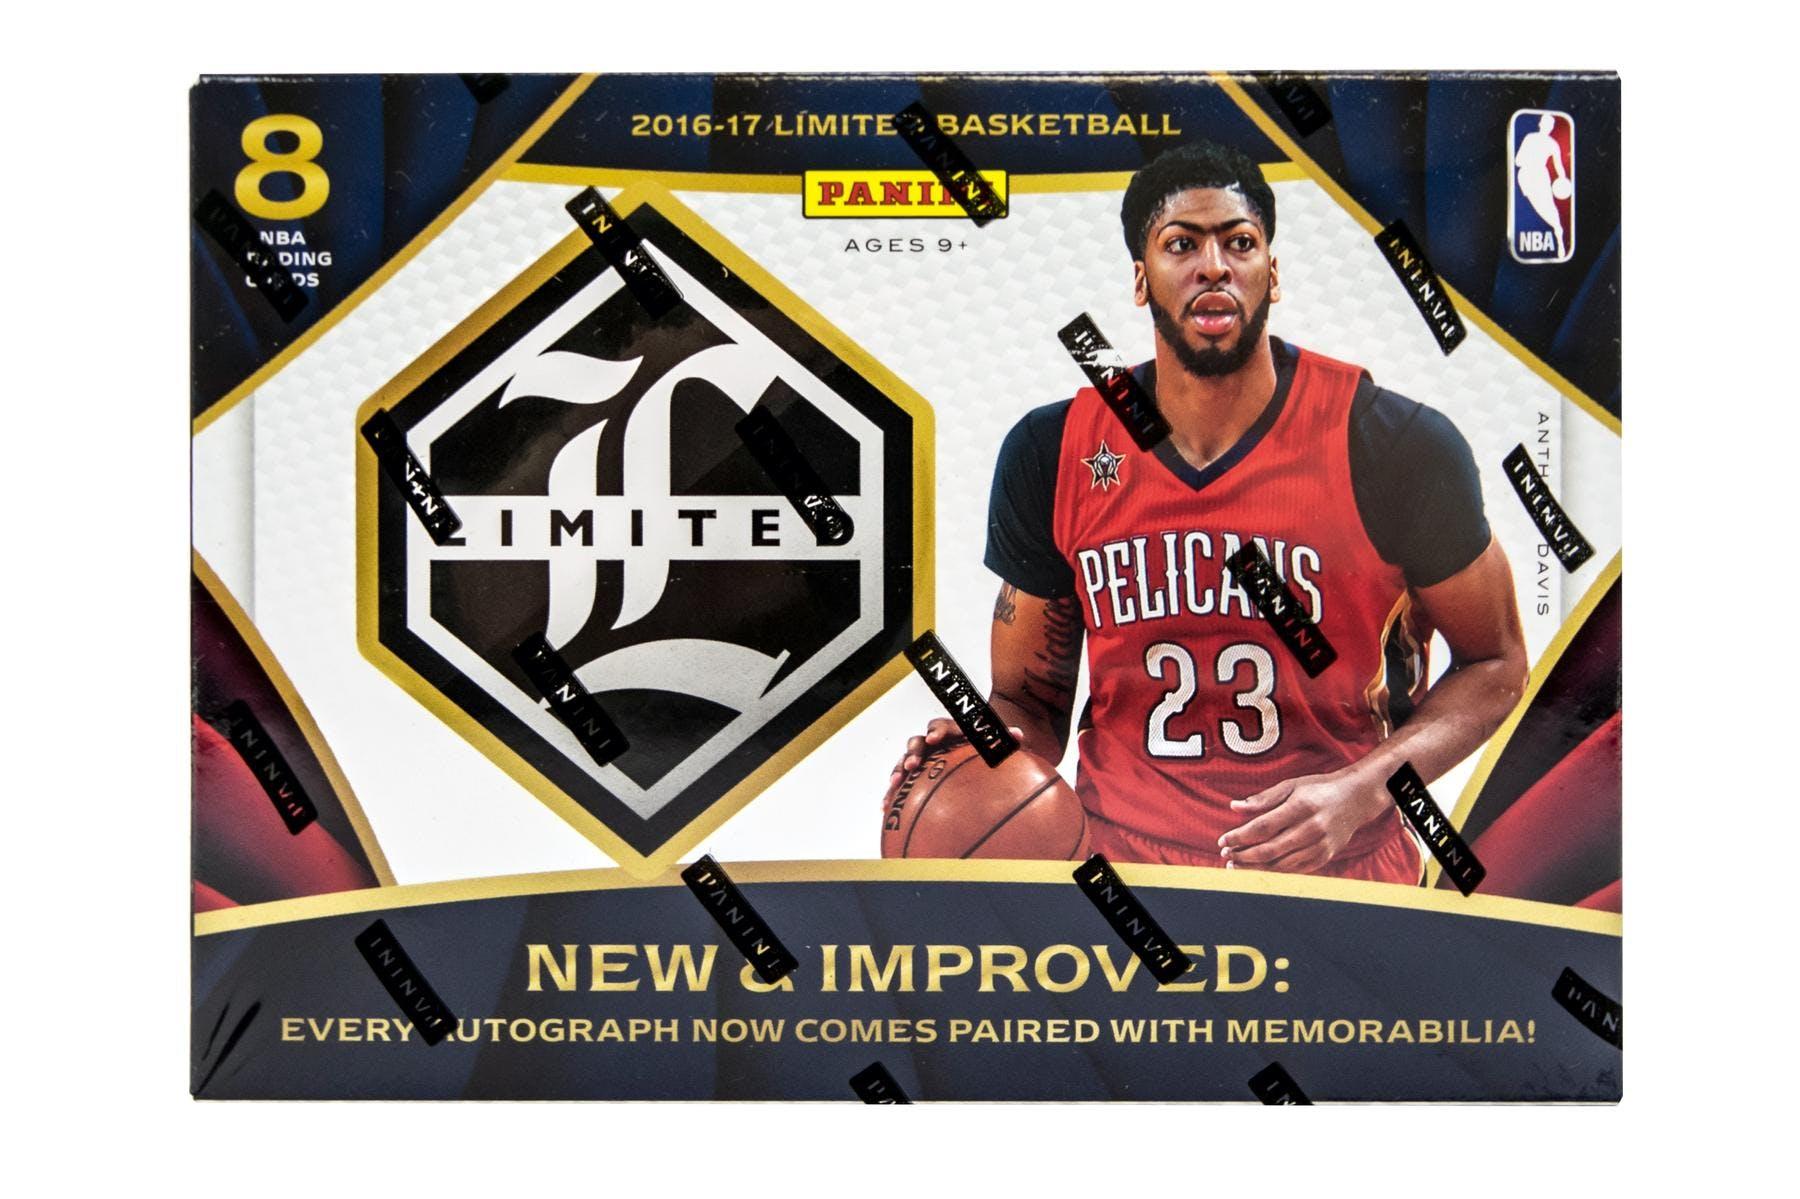 201617 Panini Limited Basketball Hobby Box